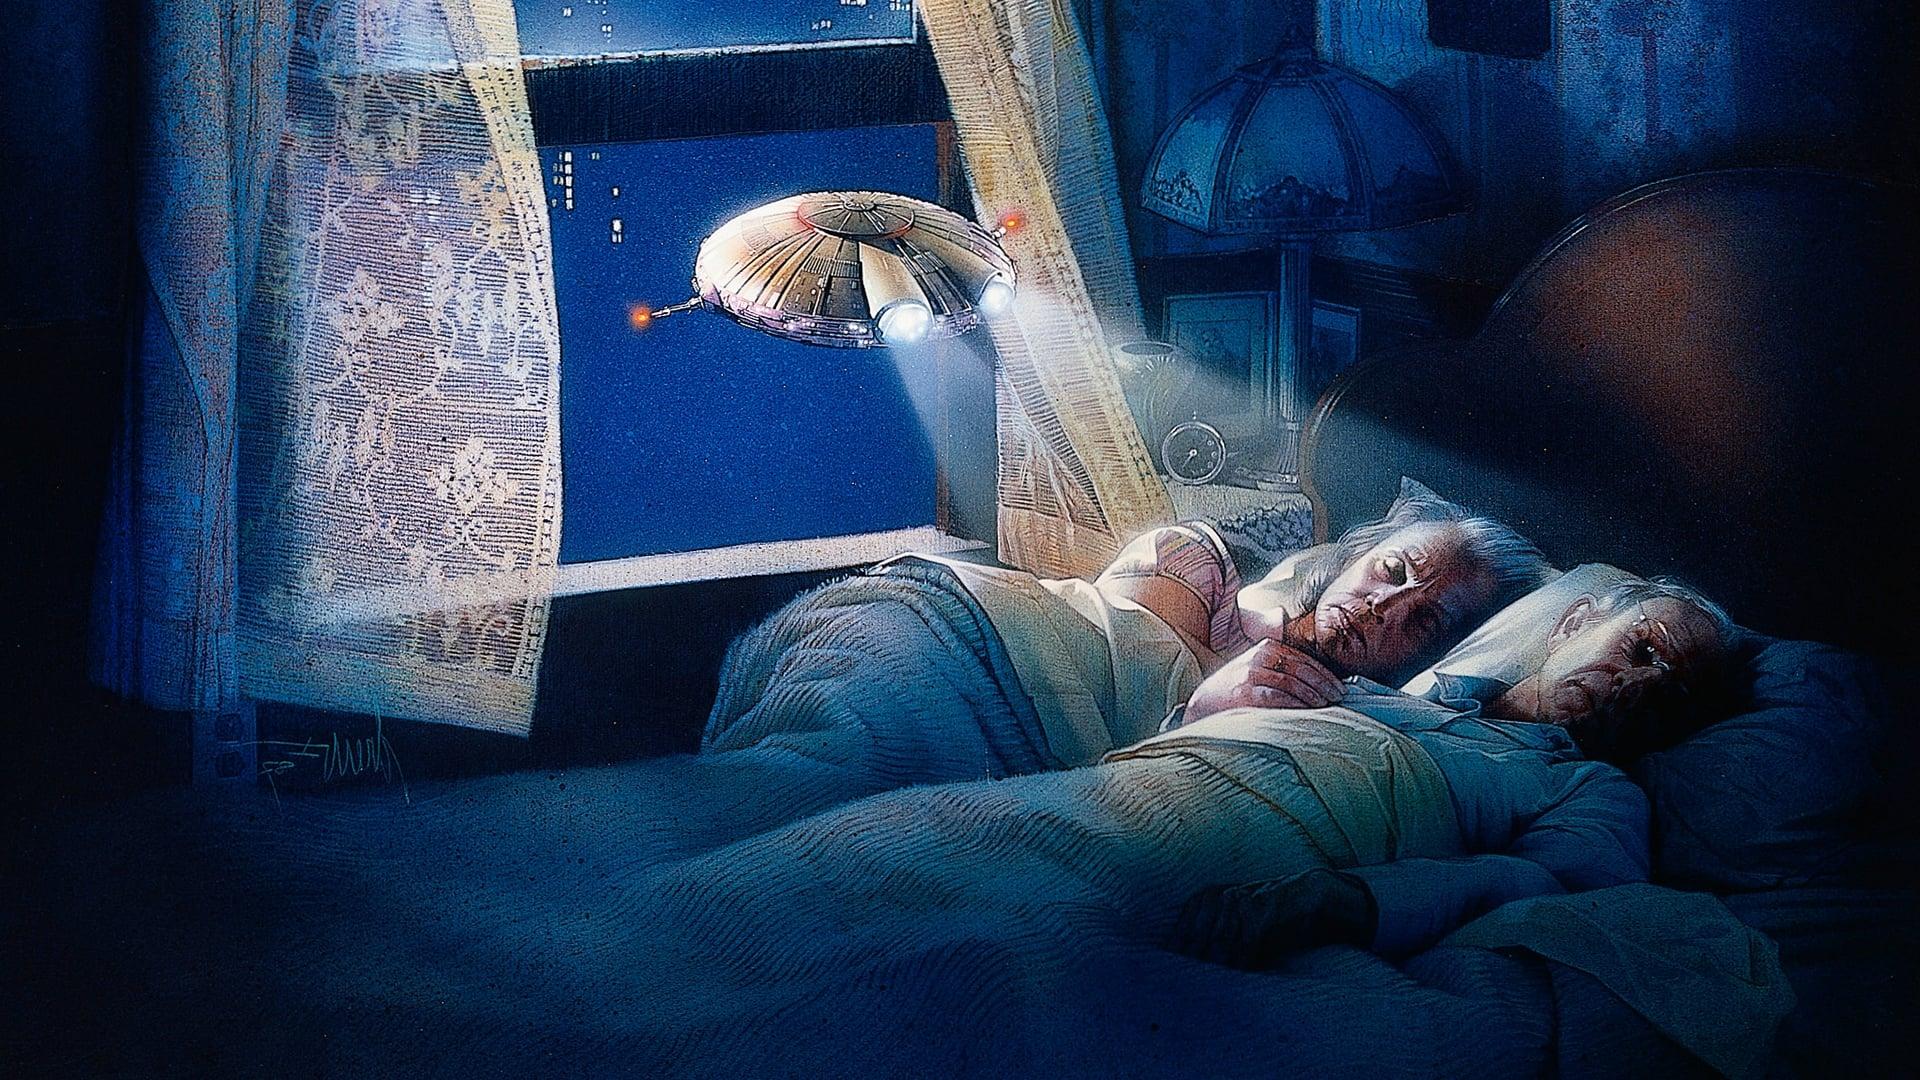 Nonton Streaming dan Download Film Seri Greys Anatomy